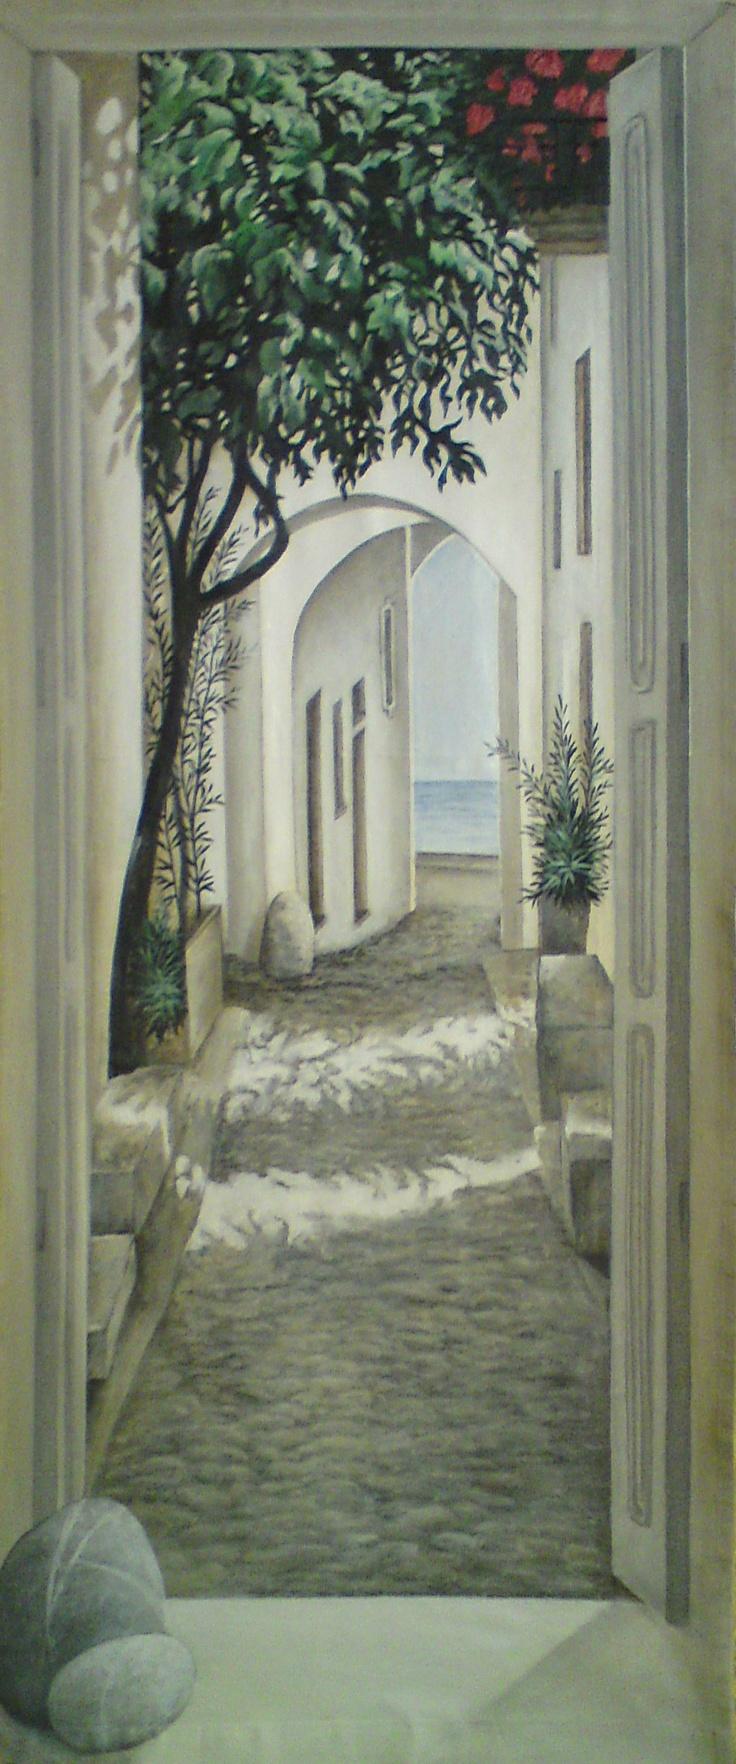 rue sud est de la france ~ painted wall mural